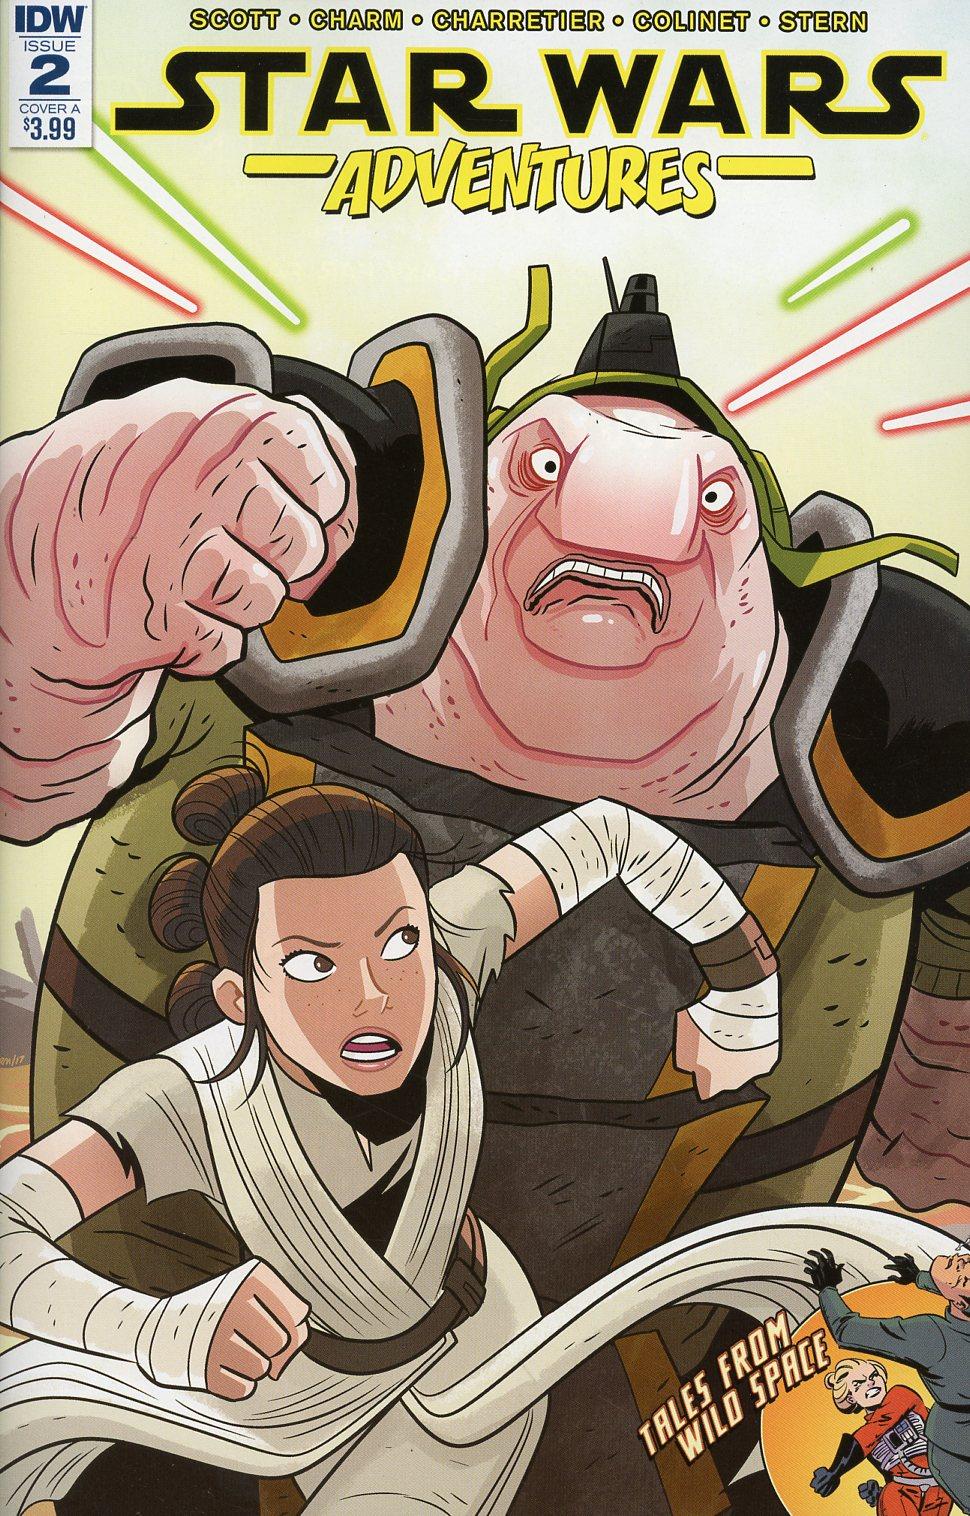 Star Wars Adventures #2 Cover A Regular Derek Charm Cover